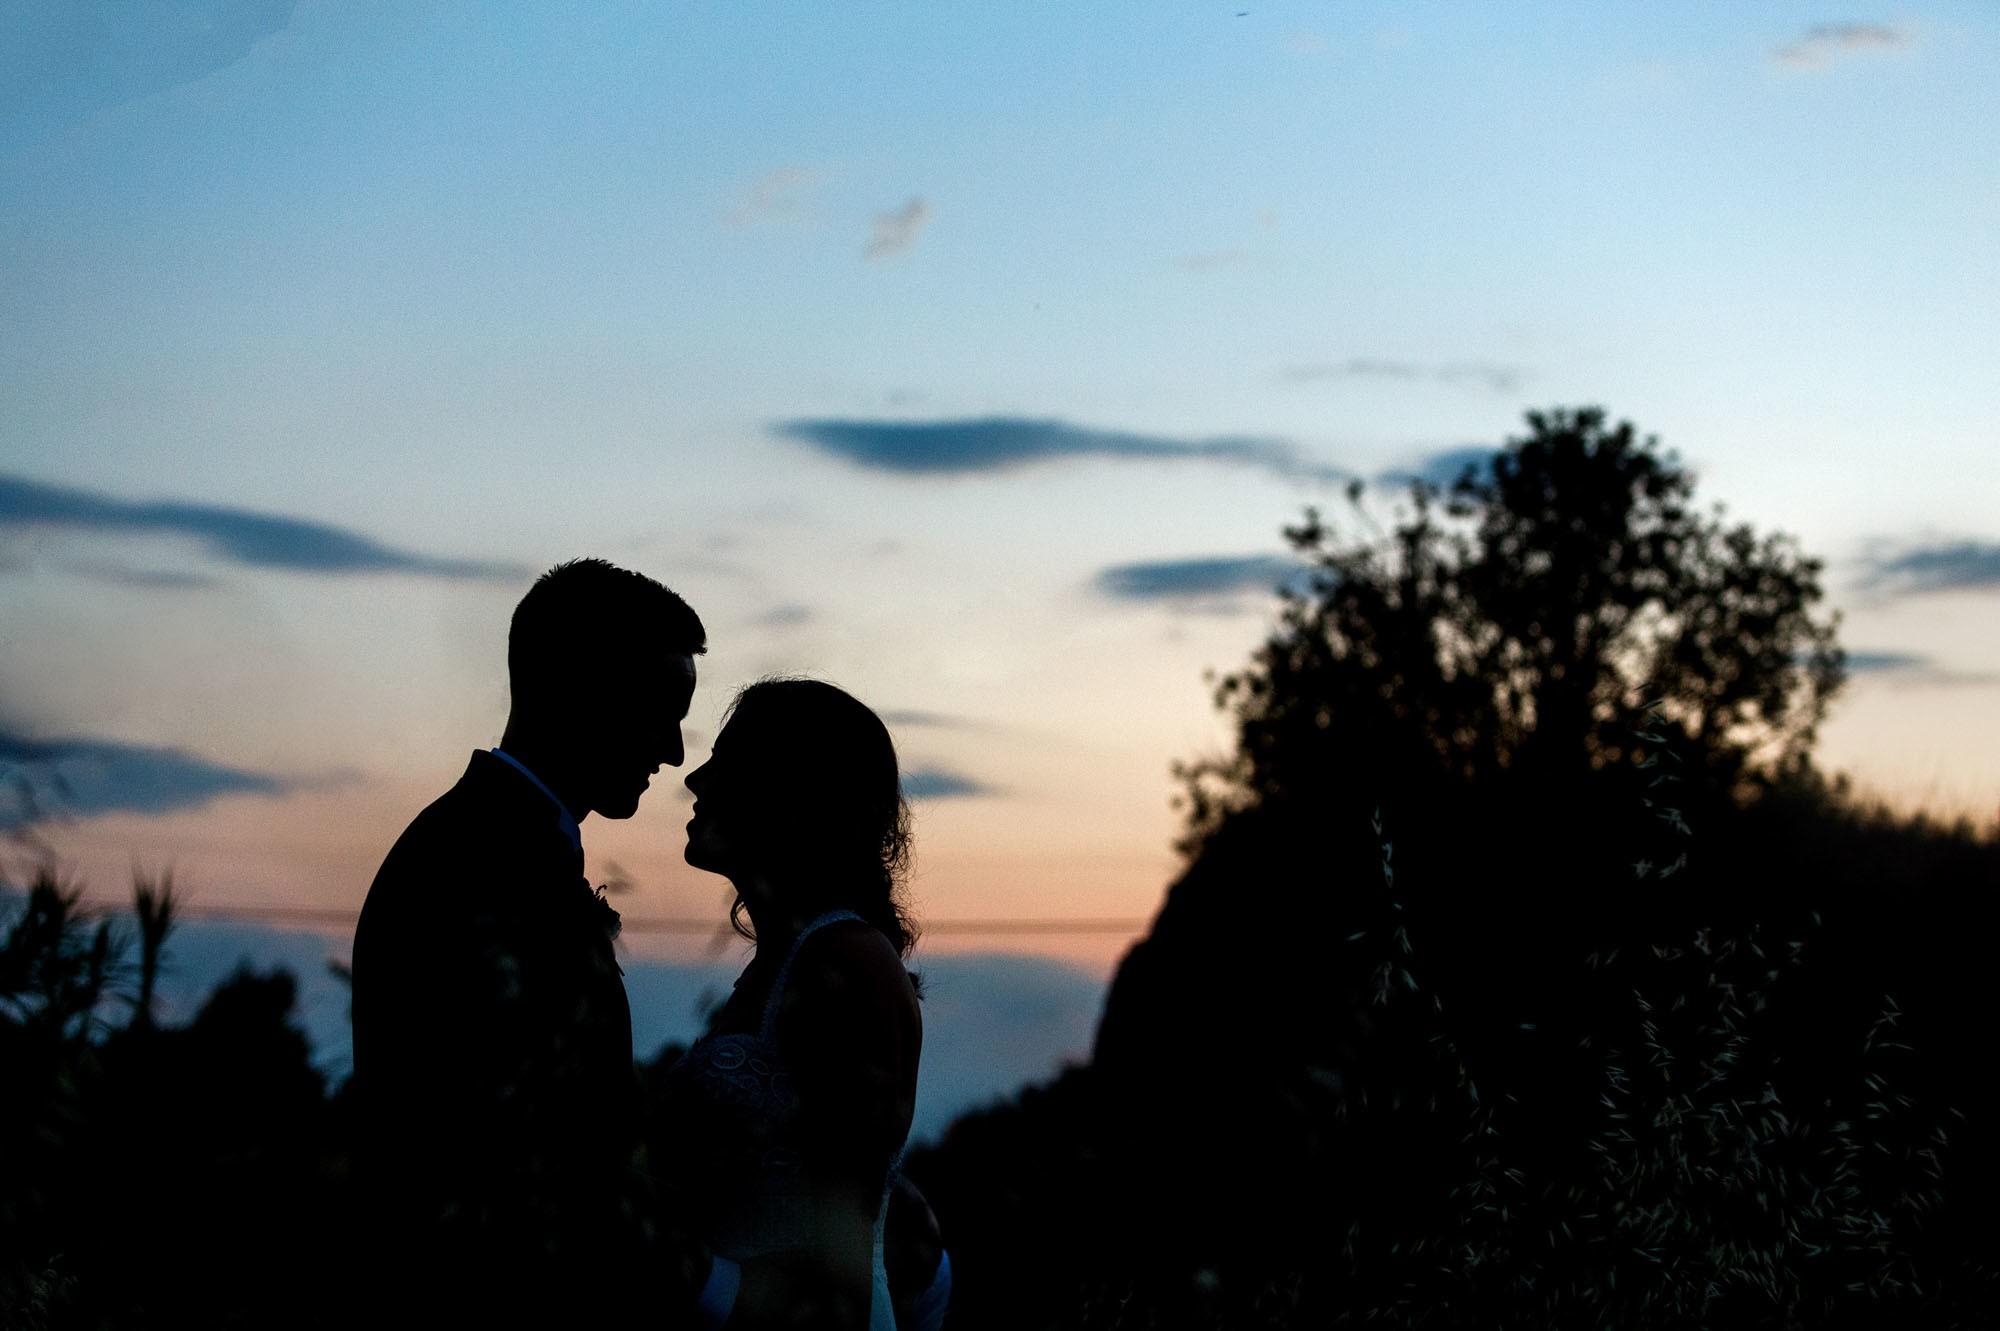 bodas-alicante-elda-vicente-esteban-8